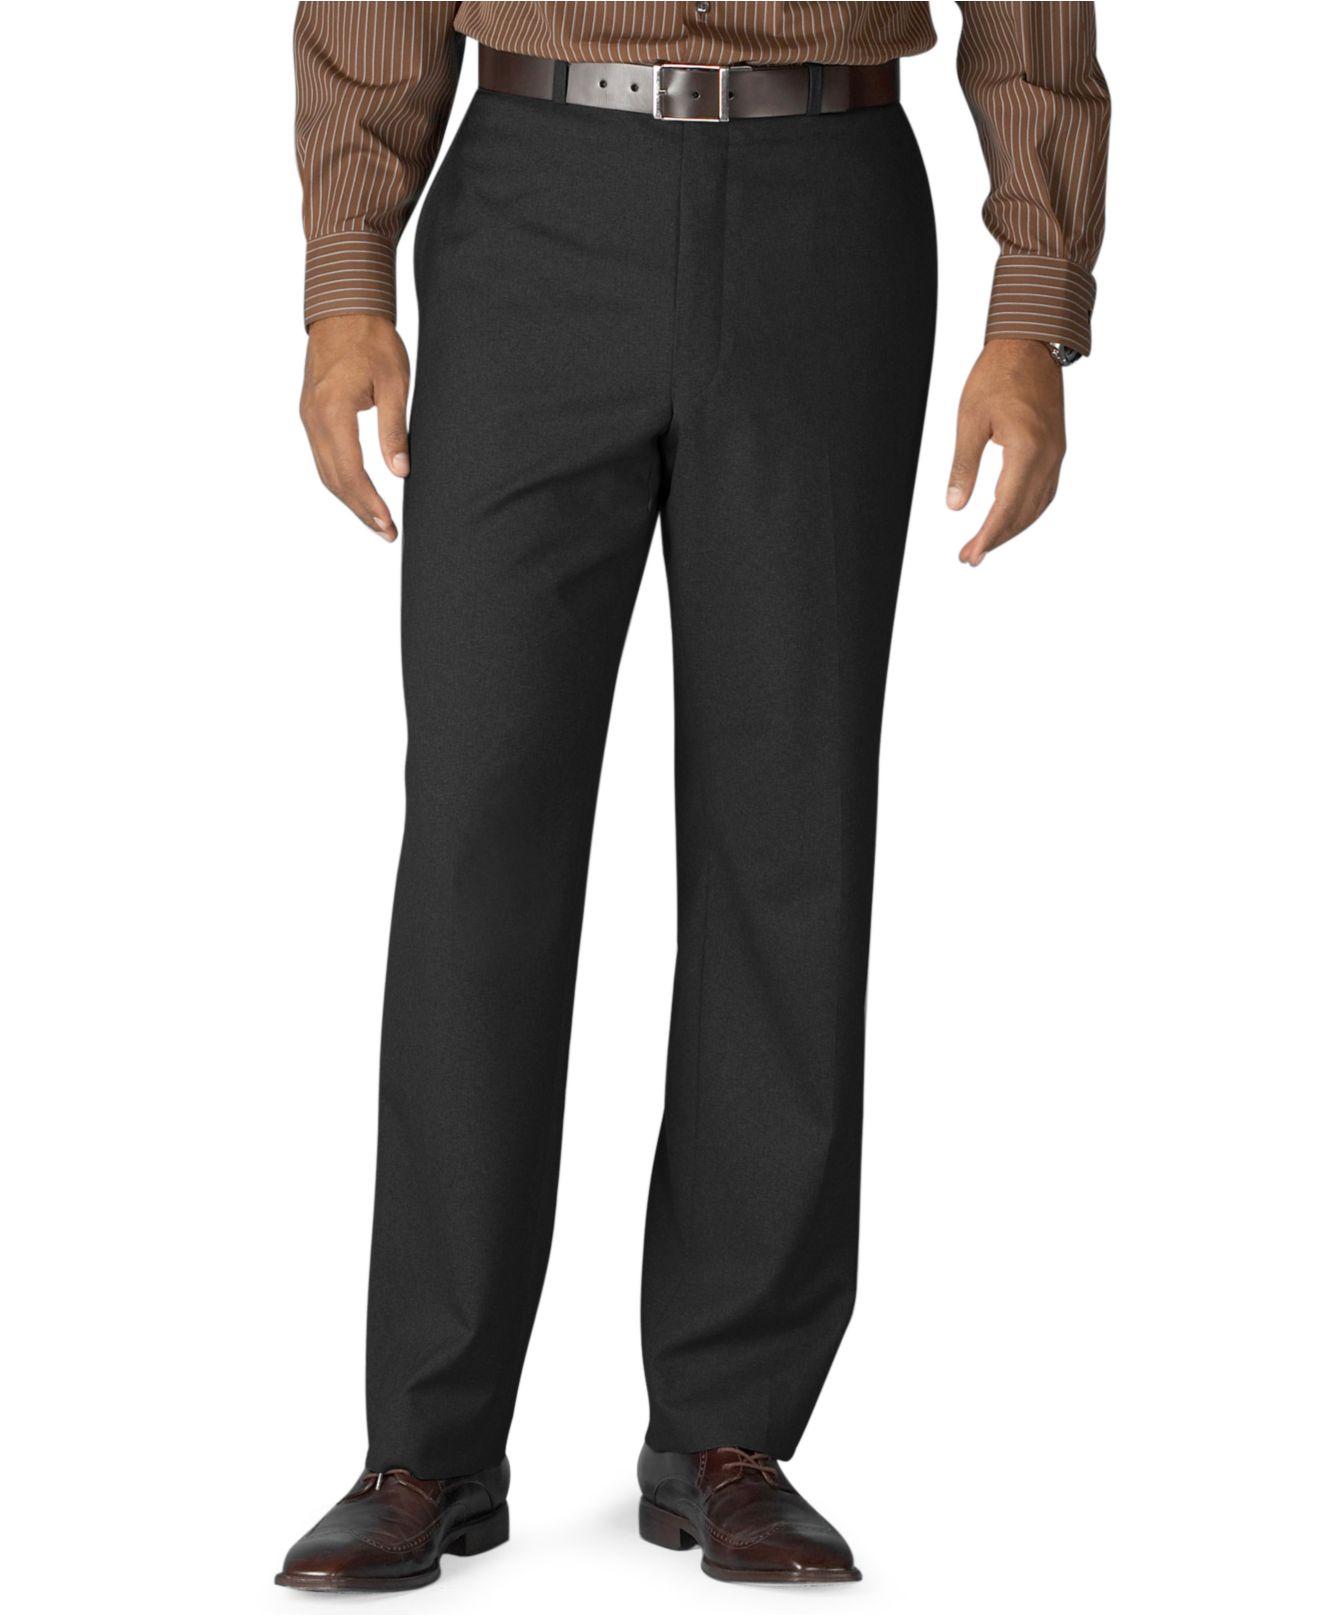 Amazing Womens Black Dress Pants Tall  Best Dress Image